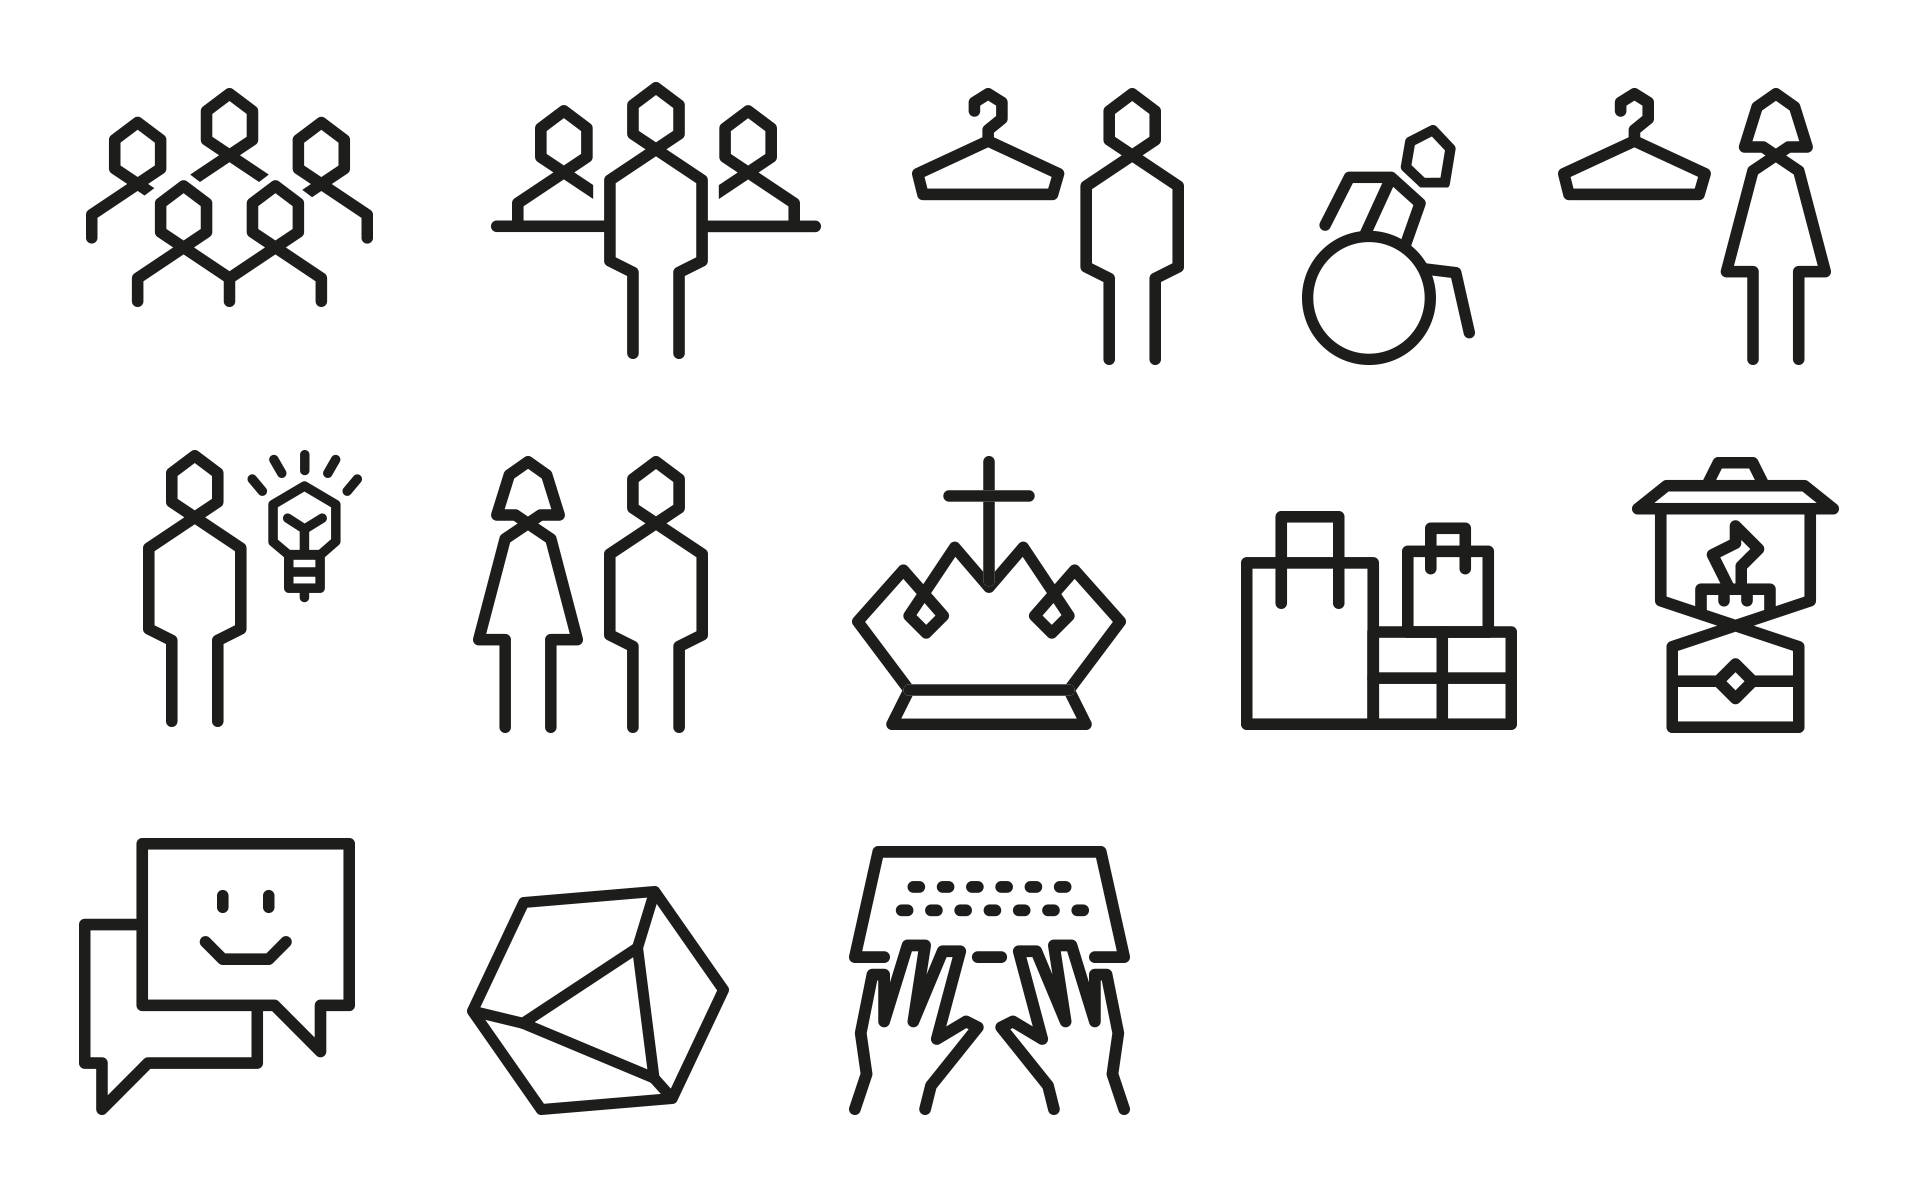 Bergstation Corporate Design, Signaletik, Piktogramme und Icons